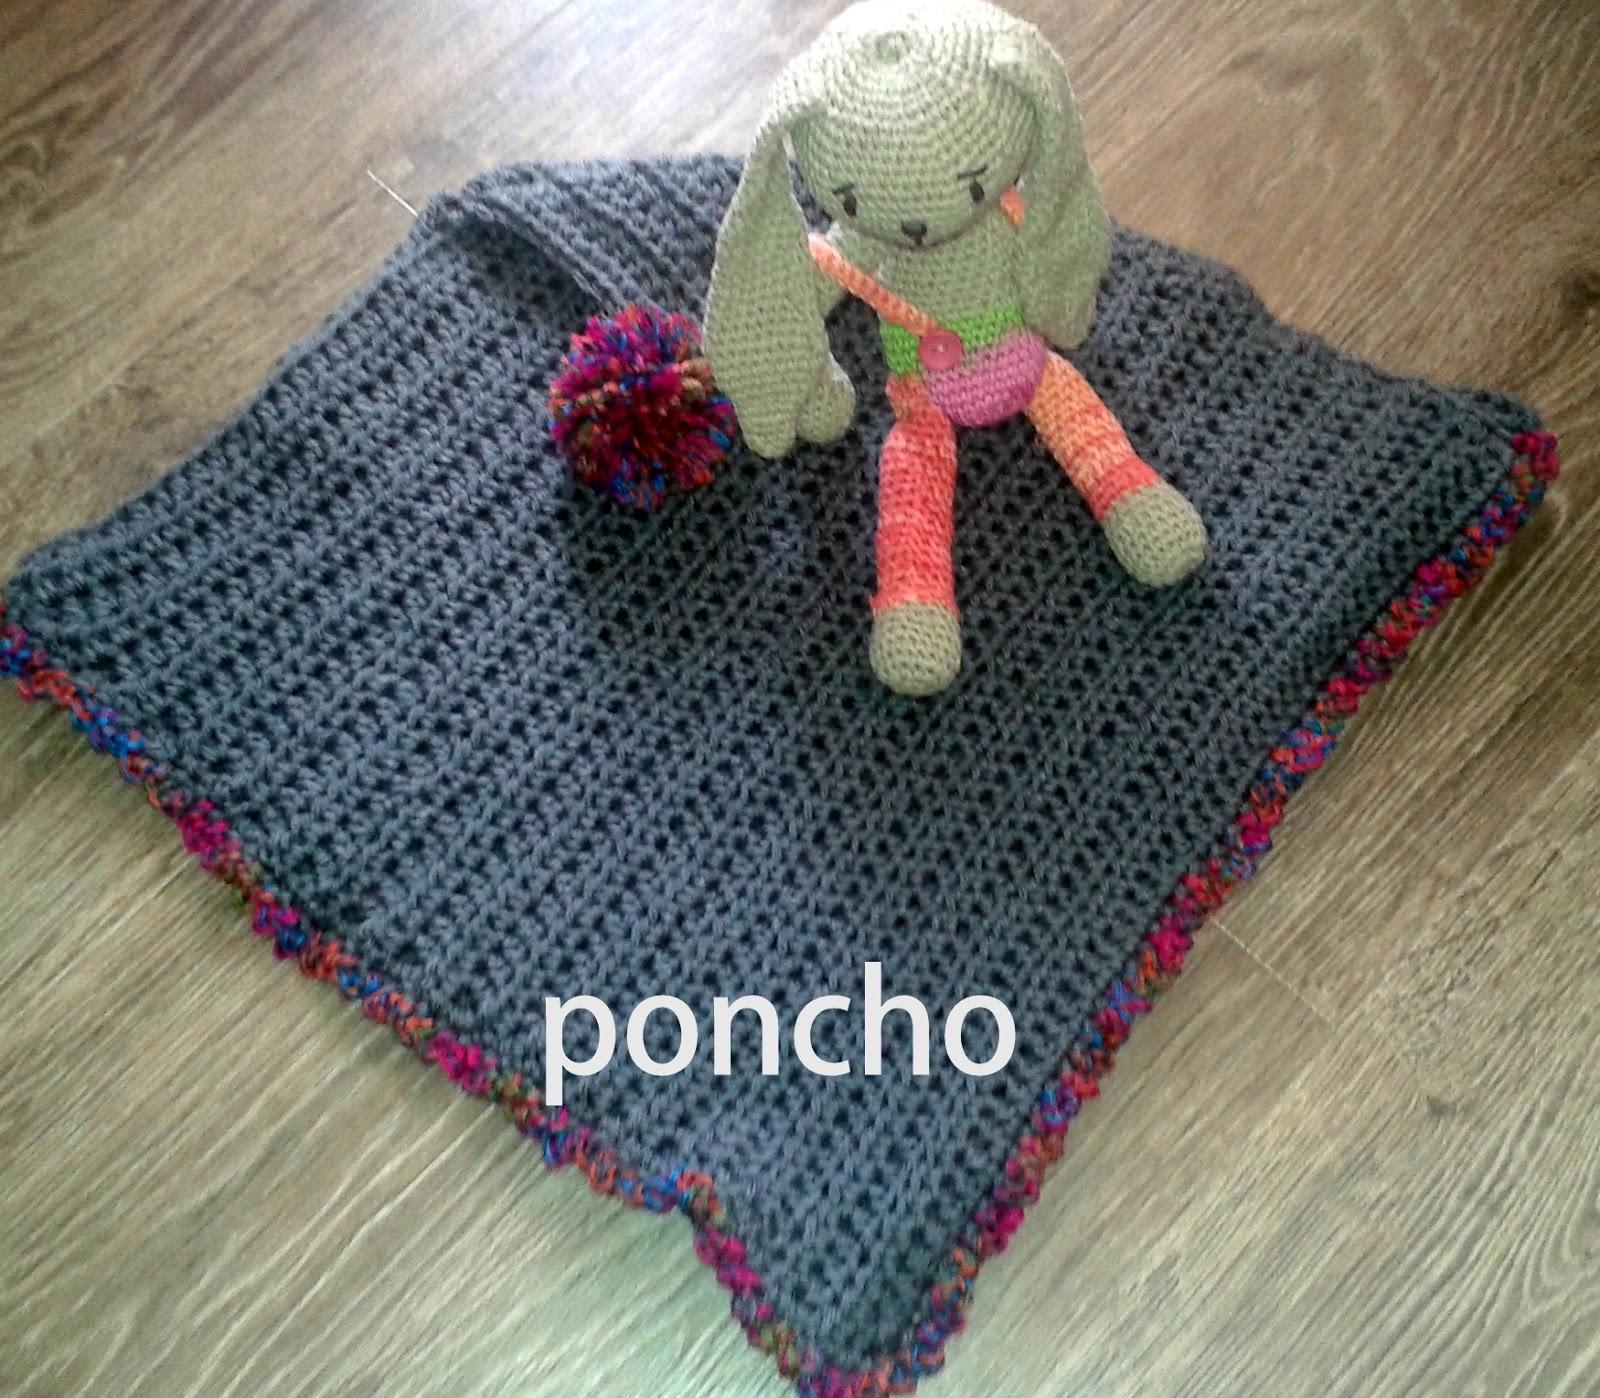 De verdad crochet: Poncho de ganchillo paso a paso para principiantes